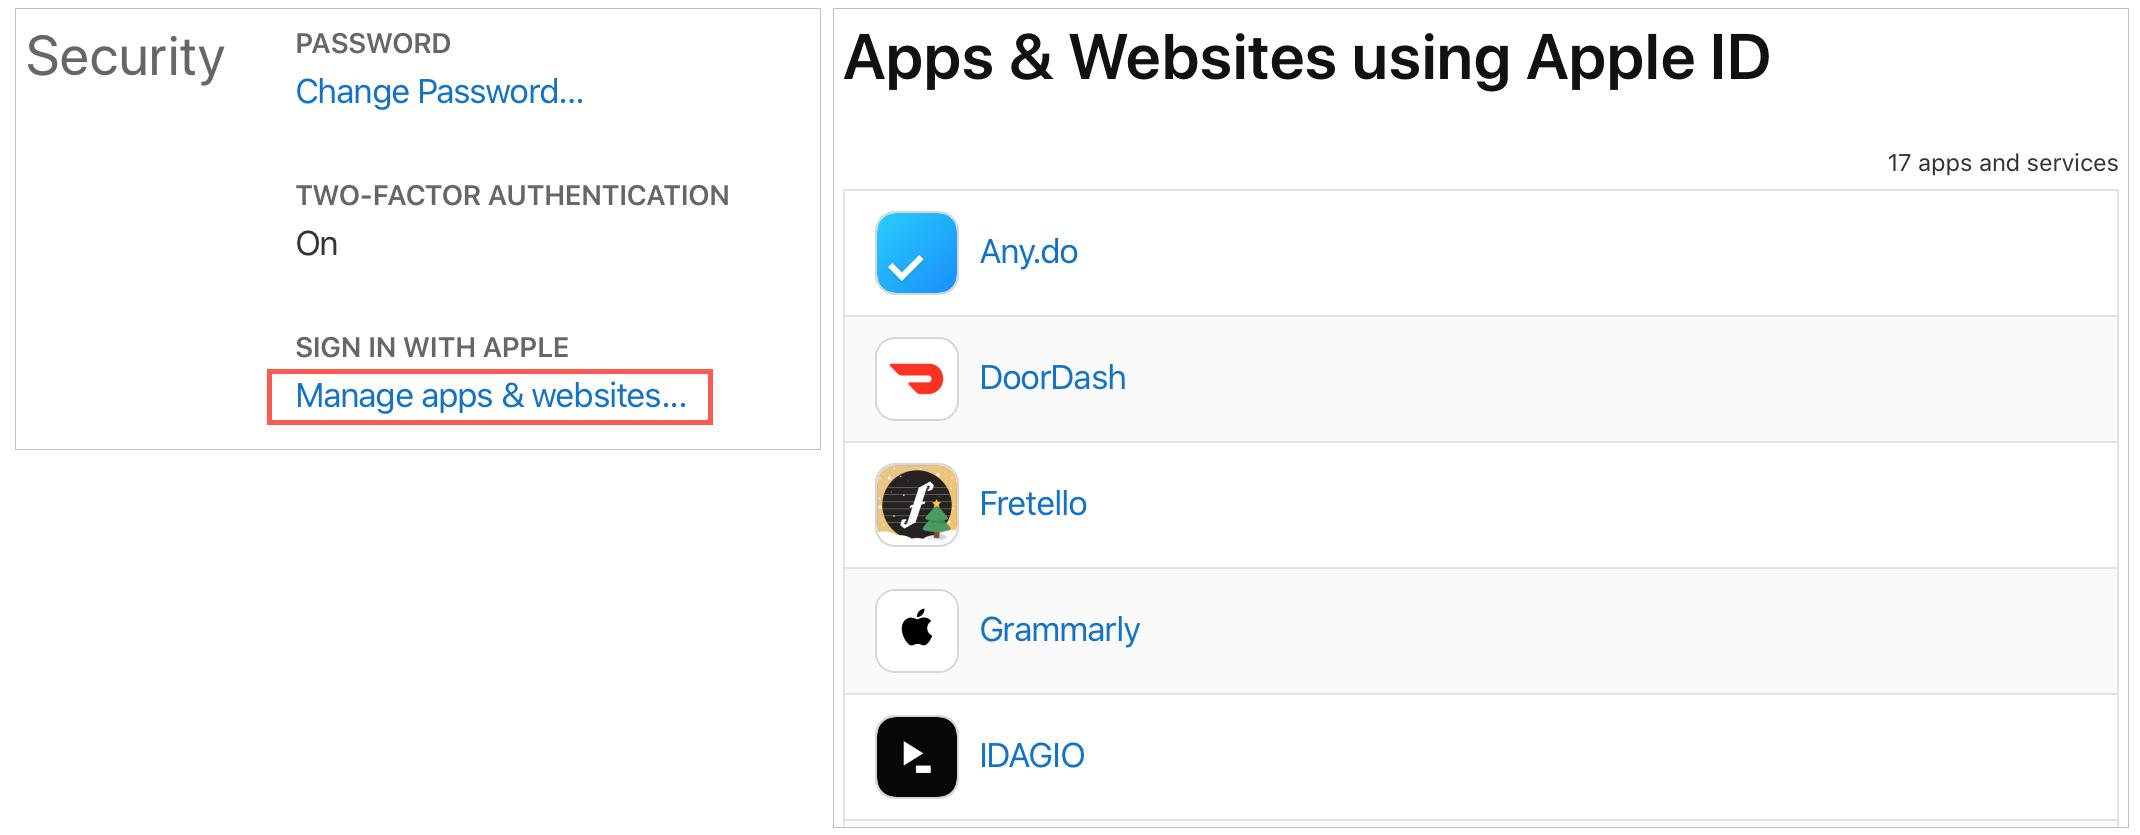 Apps Using Apple ID Online